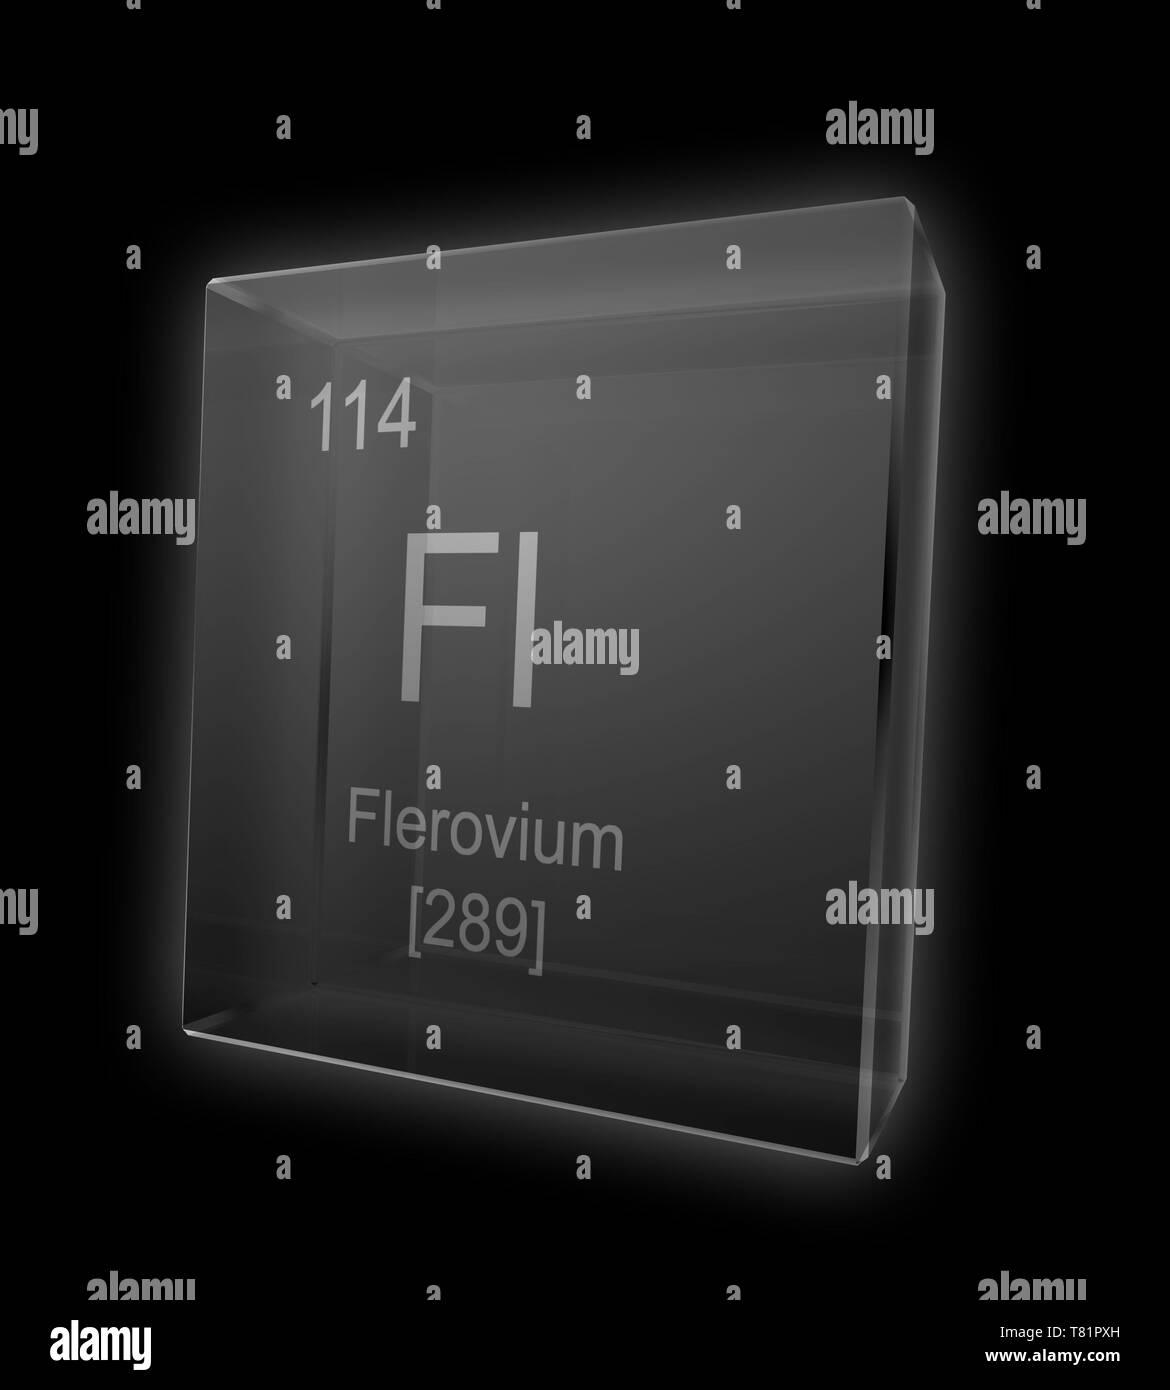 Flerovium, Chemical Element Symbol, Illustration - Stock Image